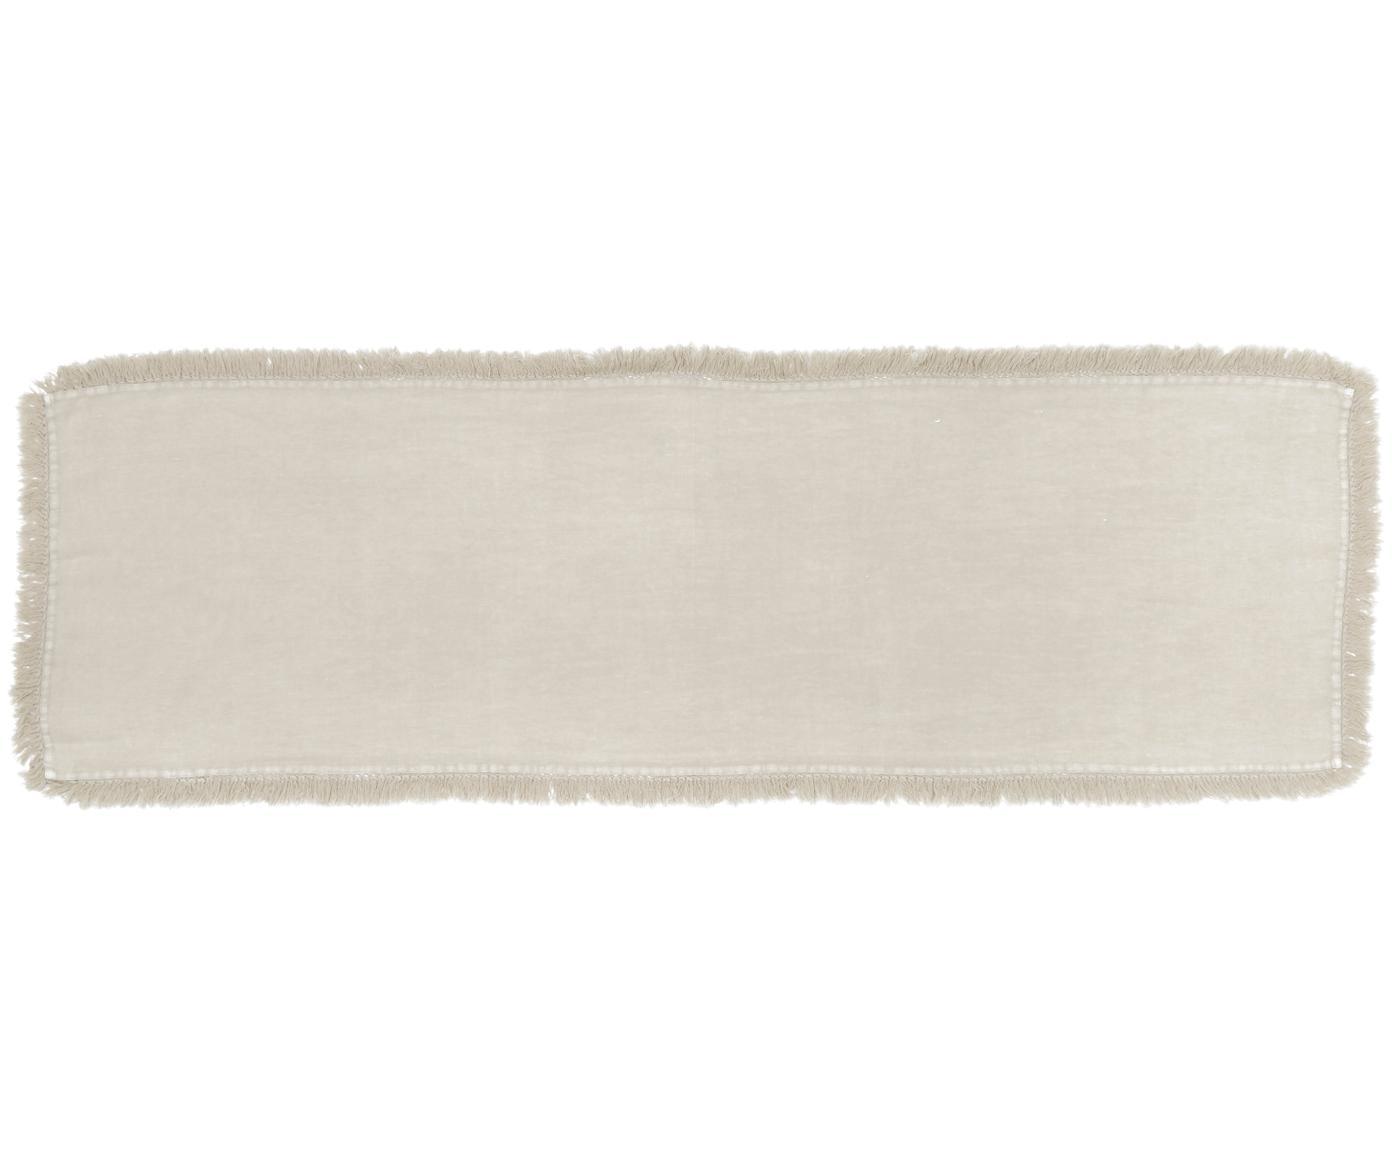 Bieżnik z lnu Newin, Len, Beżowy, S 45 x D 150 cm